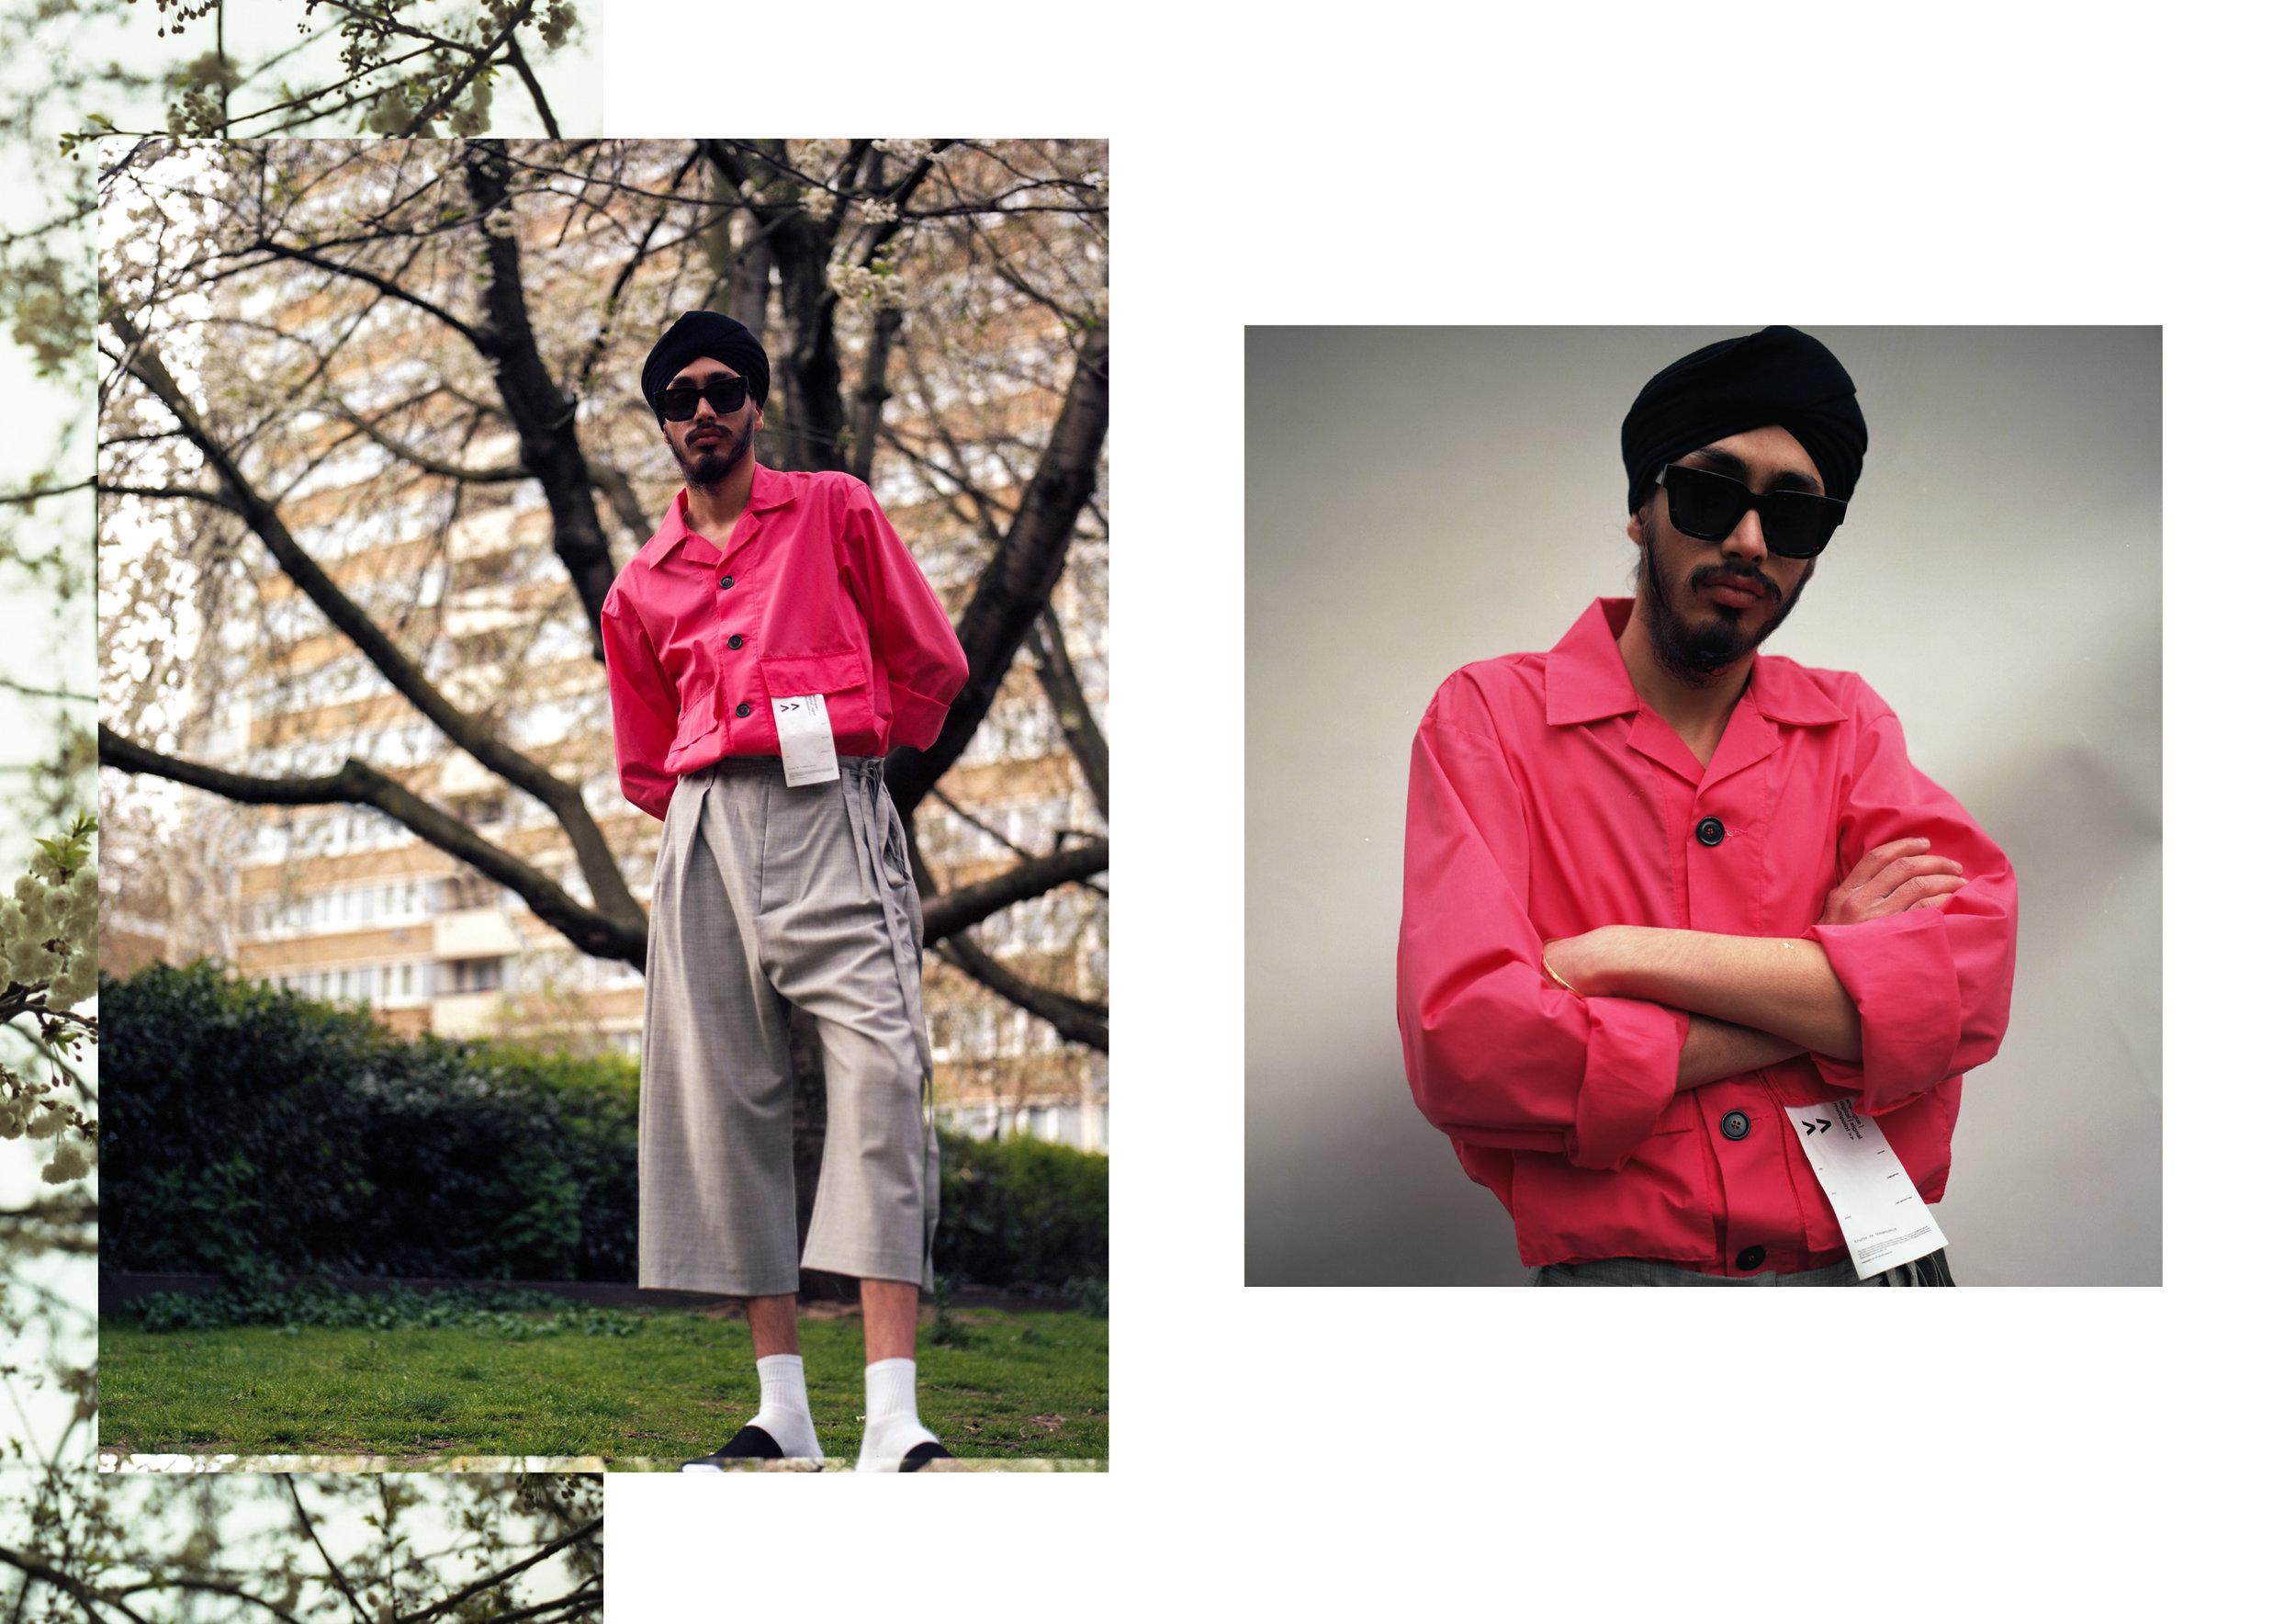 All clothes - Tourne de Transmission, Eyewear - Ace & Tate, Footwear - Clarks Originals